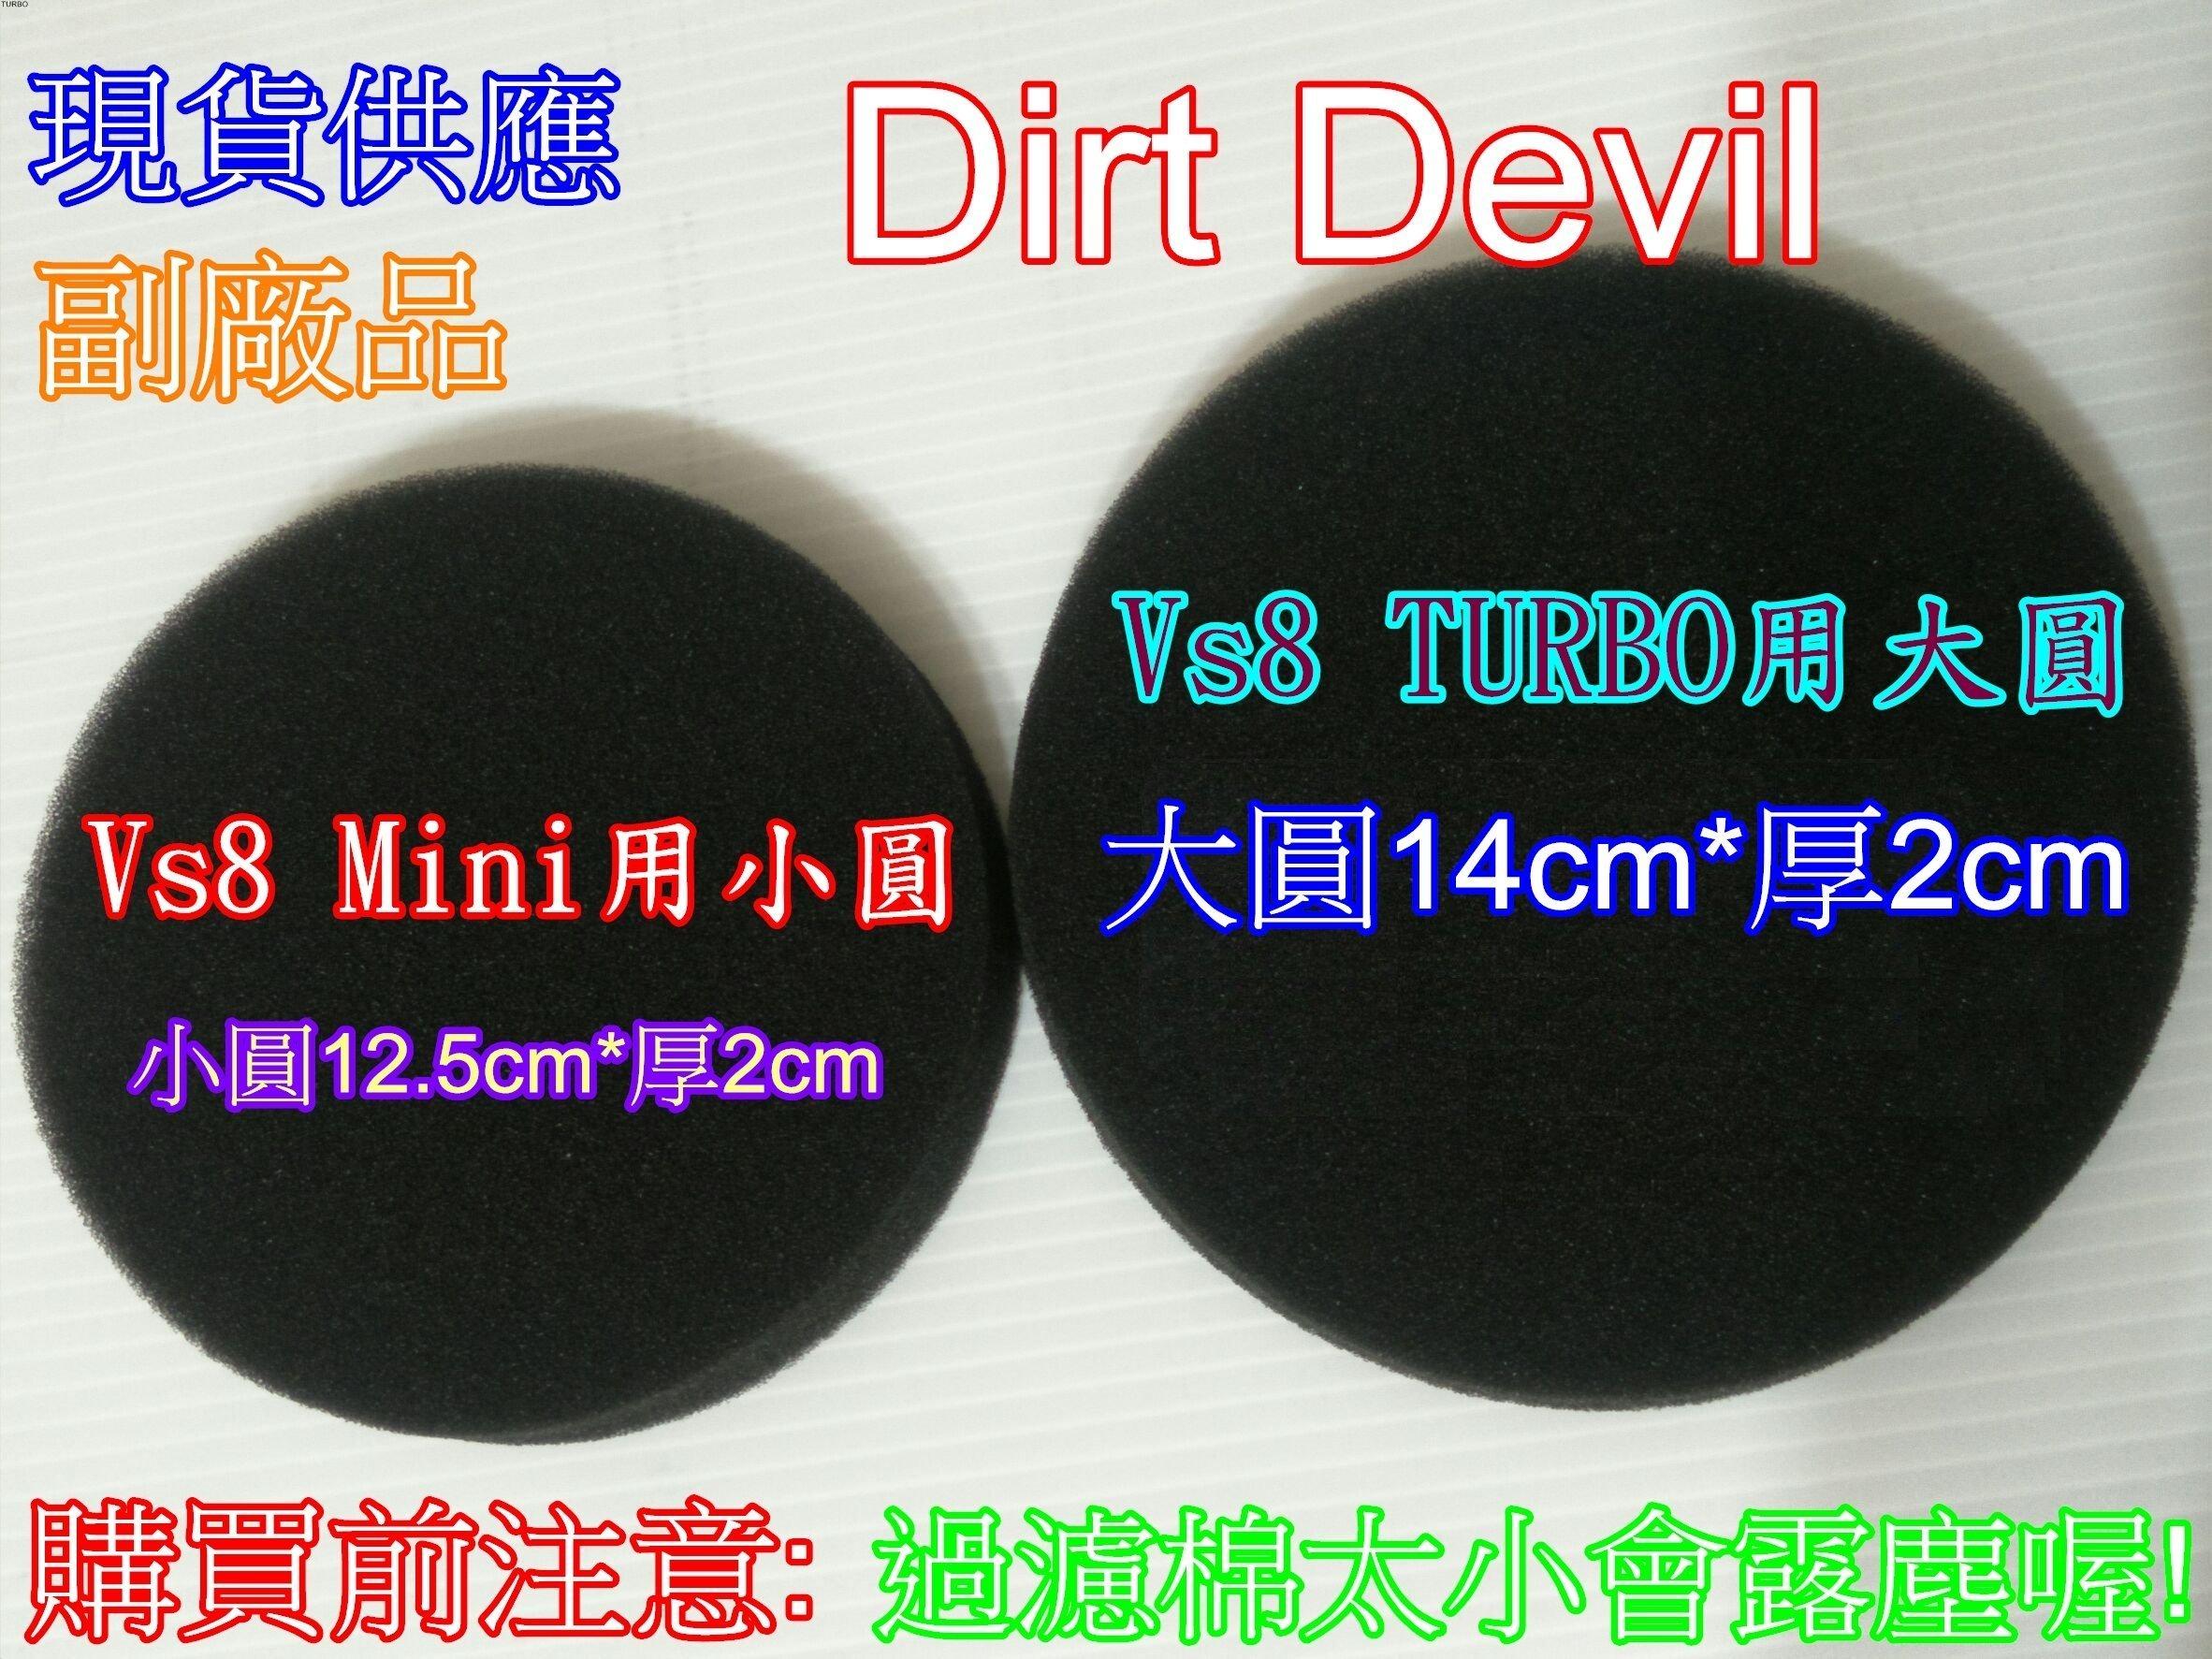 【Dirt Devil V8S TURBO大圓下標區】吸塵器通用黑過濾棉/延長管/軟管/直管/ 手握管/接頭配件詢問